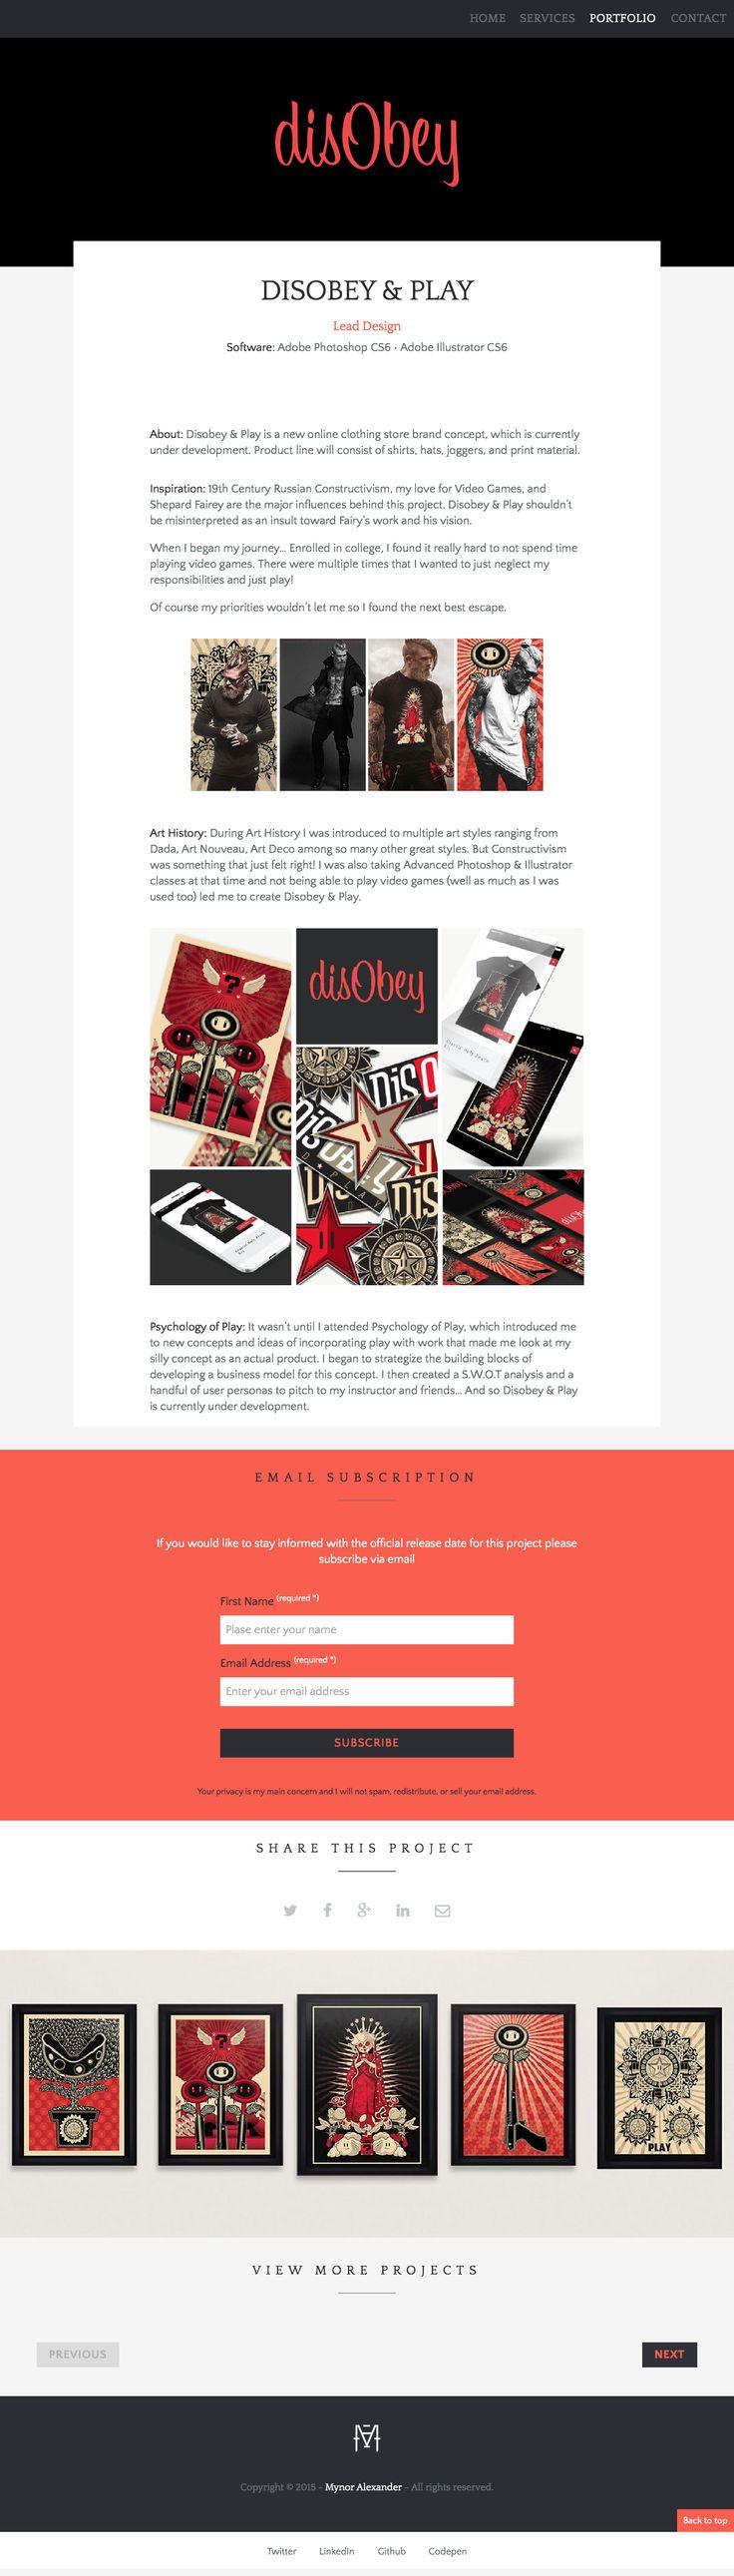 "Disobey & Play - Design Concept by Mynor ""Bugsy"" Alexander  #bugsy #website #portfolio #illustration #brand #design #portfolio #mynor #alexander #disobey #play #gaming #super #mario #nes #clothing #fashion #online"